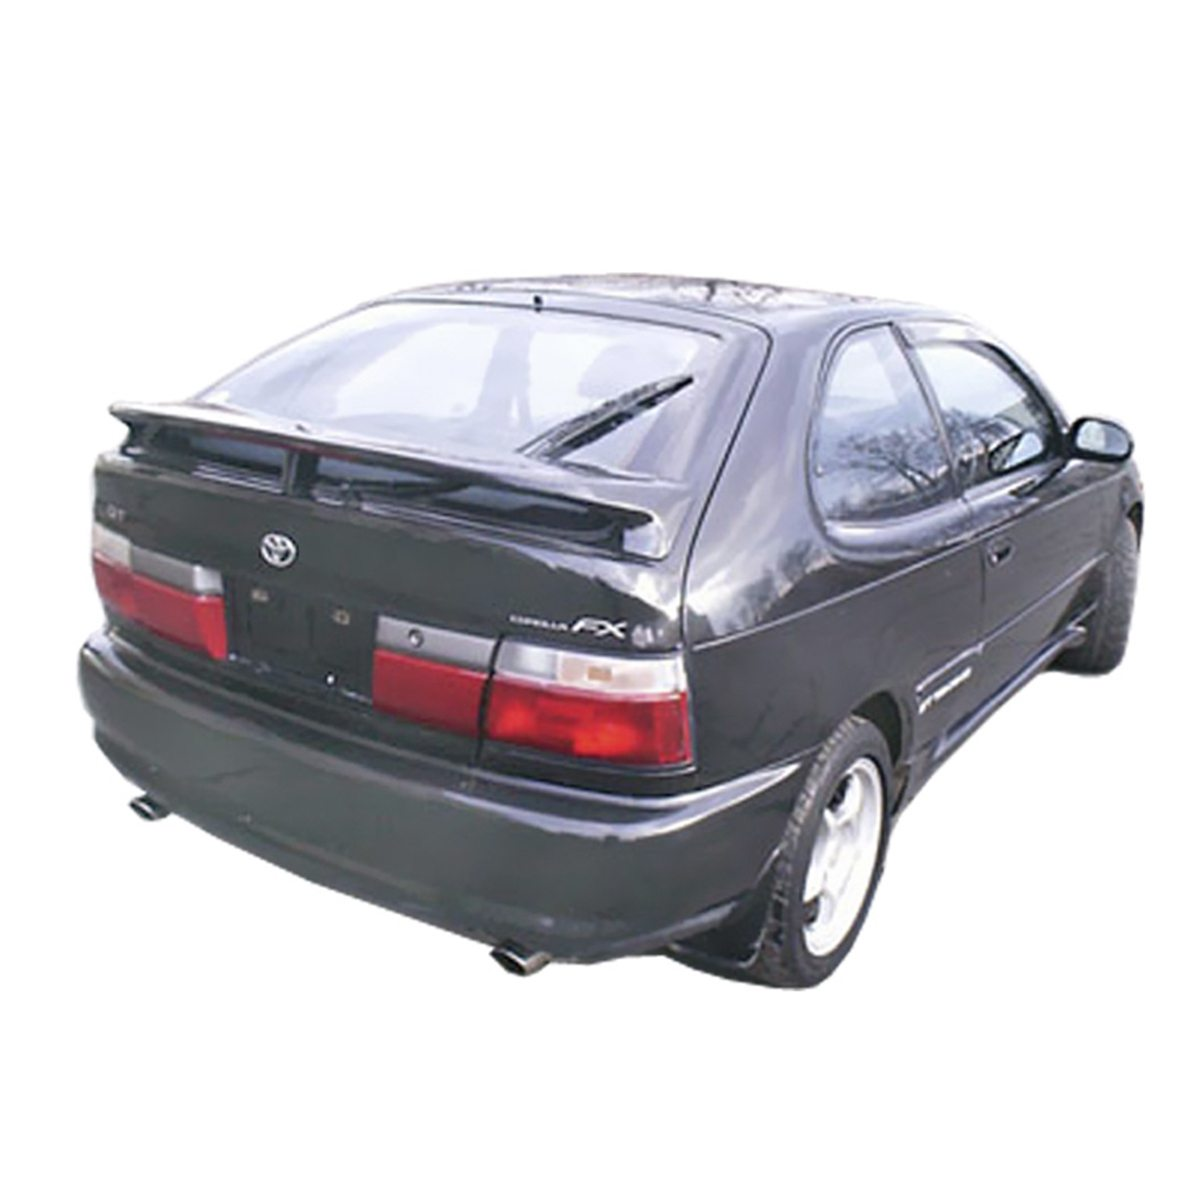 Toyota-E10-Starvan-Tras-PCC037